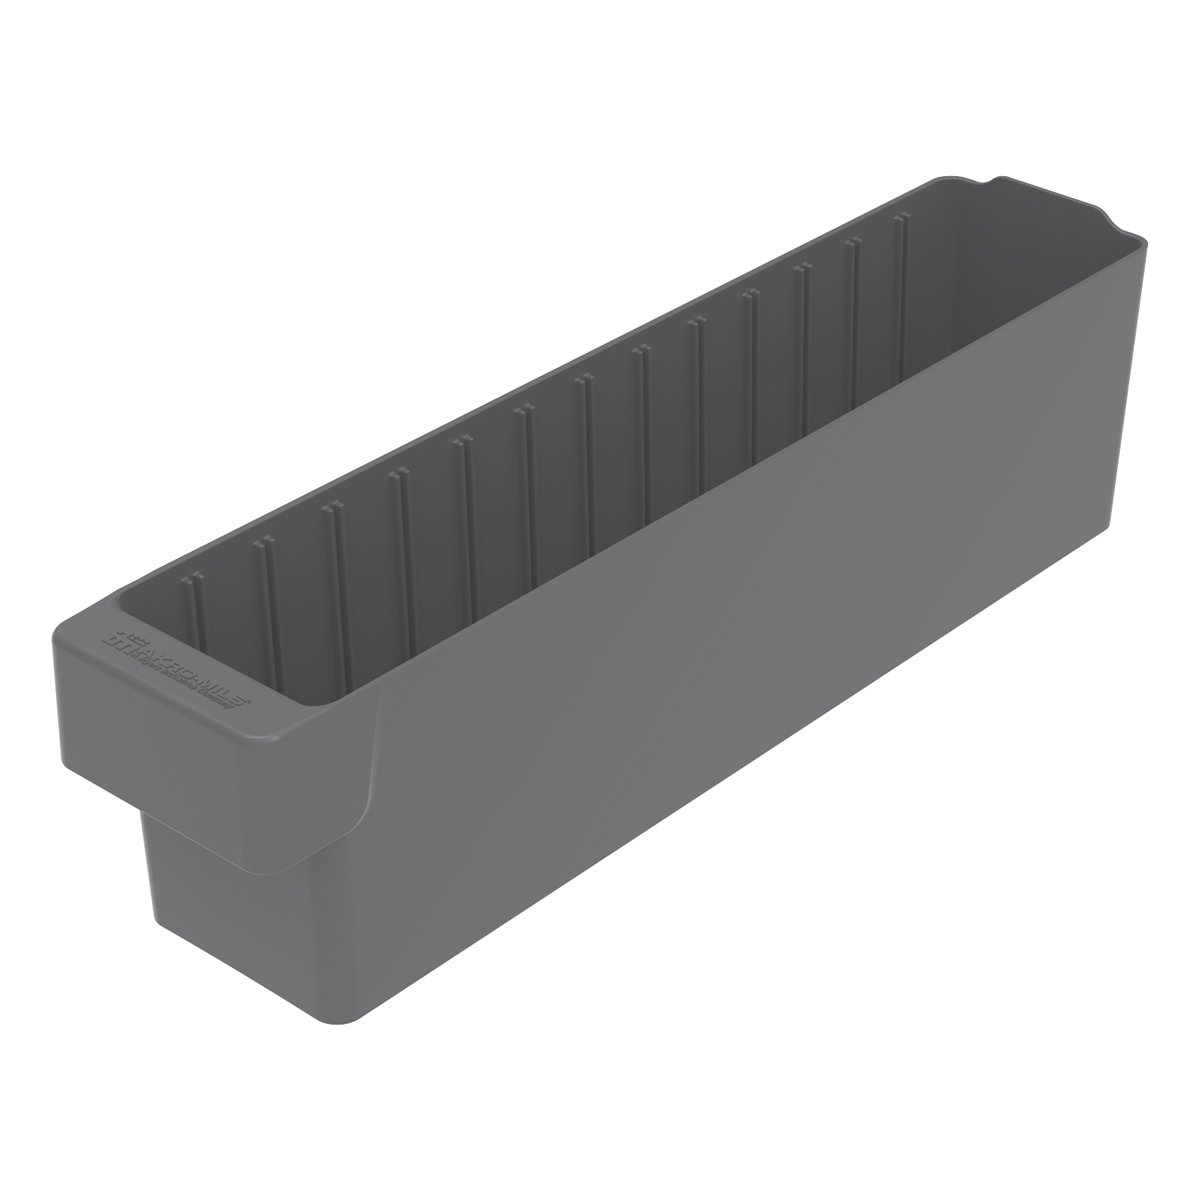 Akro-Mils 31148 17-5/8-Inch L by 3-3/4-Inch W by 4-5/8-Inch H, AkroDrawer Plastic Storage Drawer, Grey, Case of 6